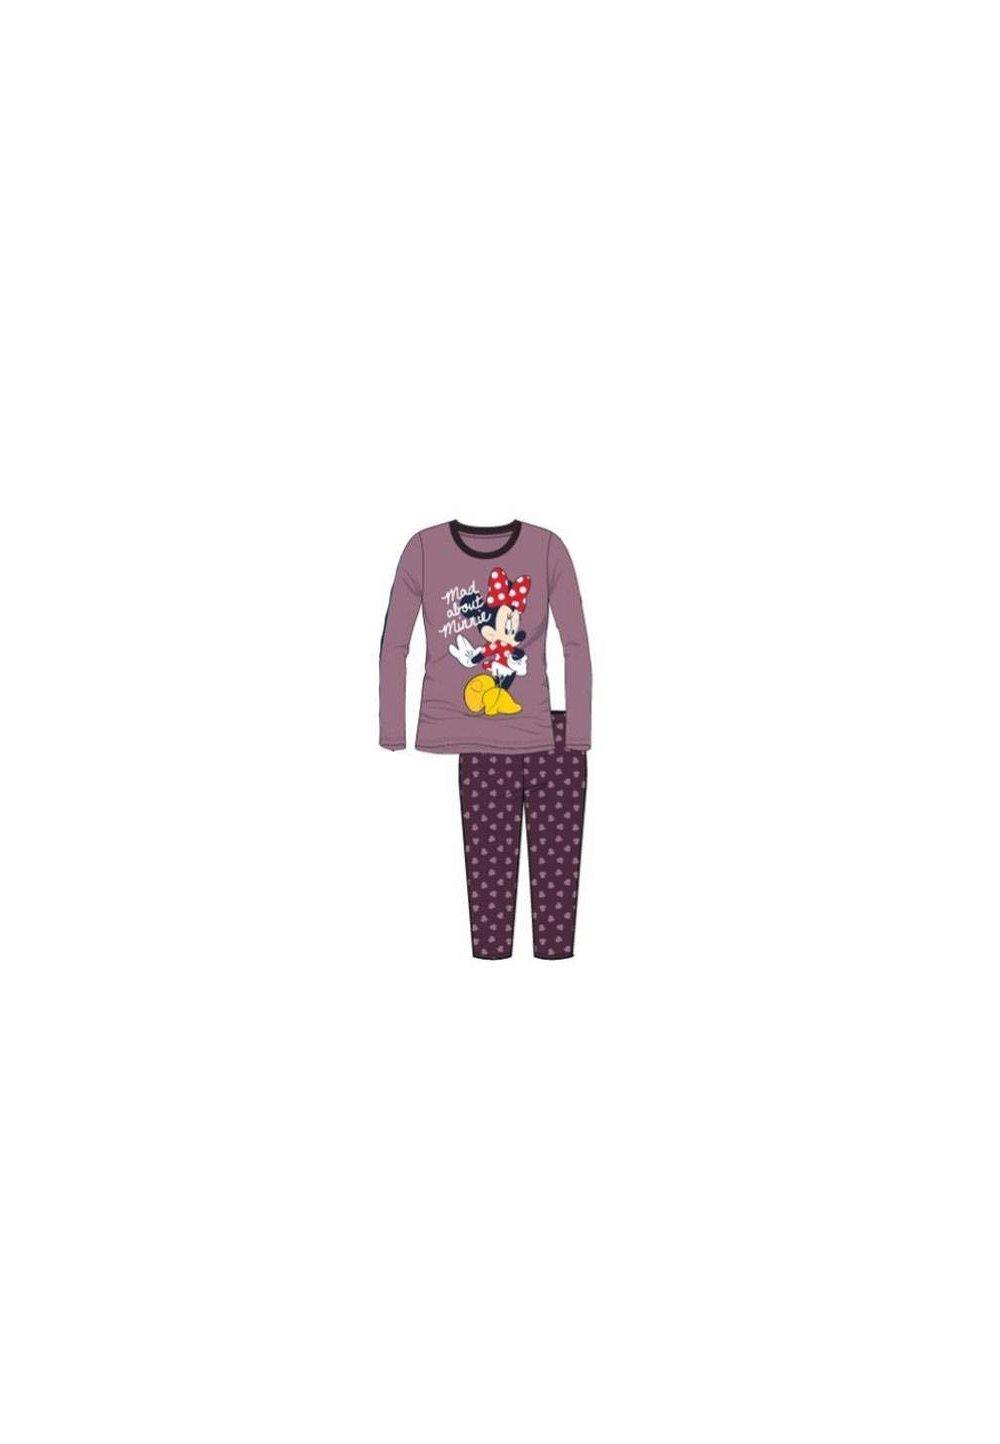 Pijama visinie, pantalon 3/4, Minnie Mouse imagine